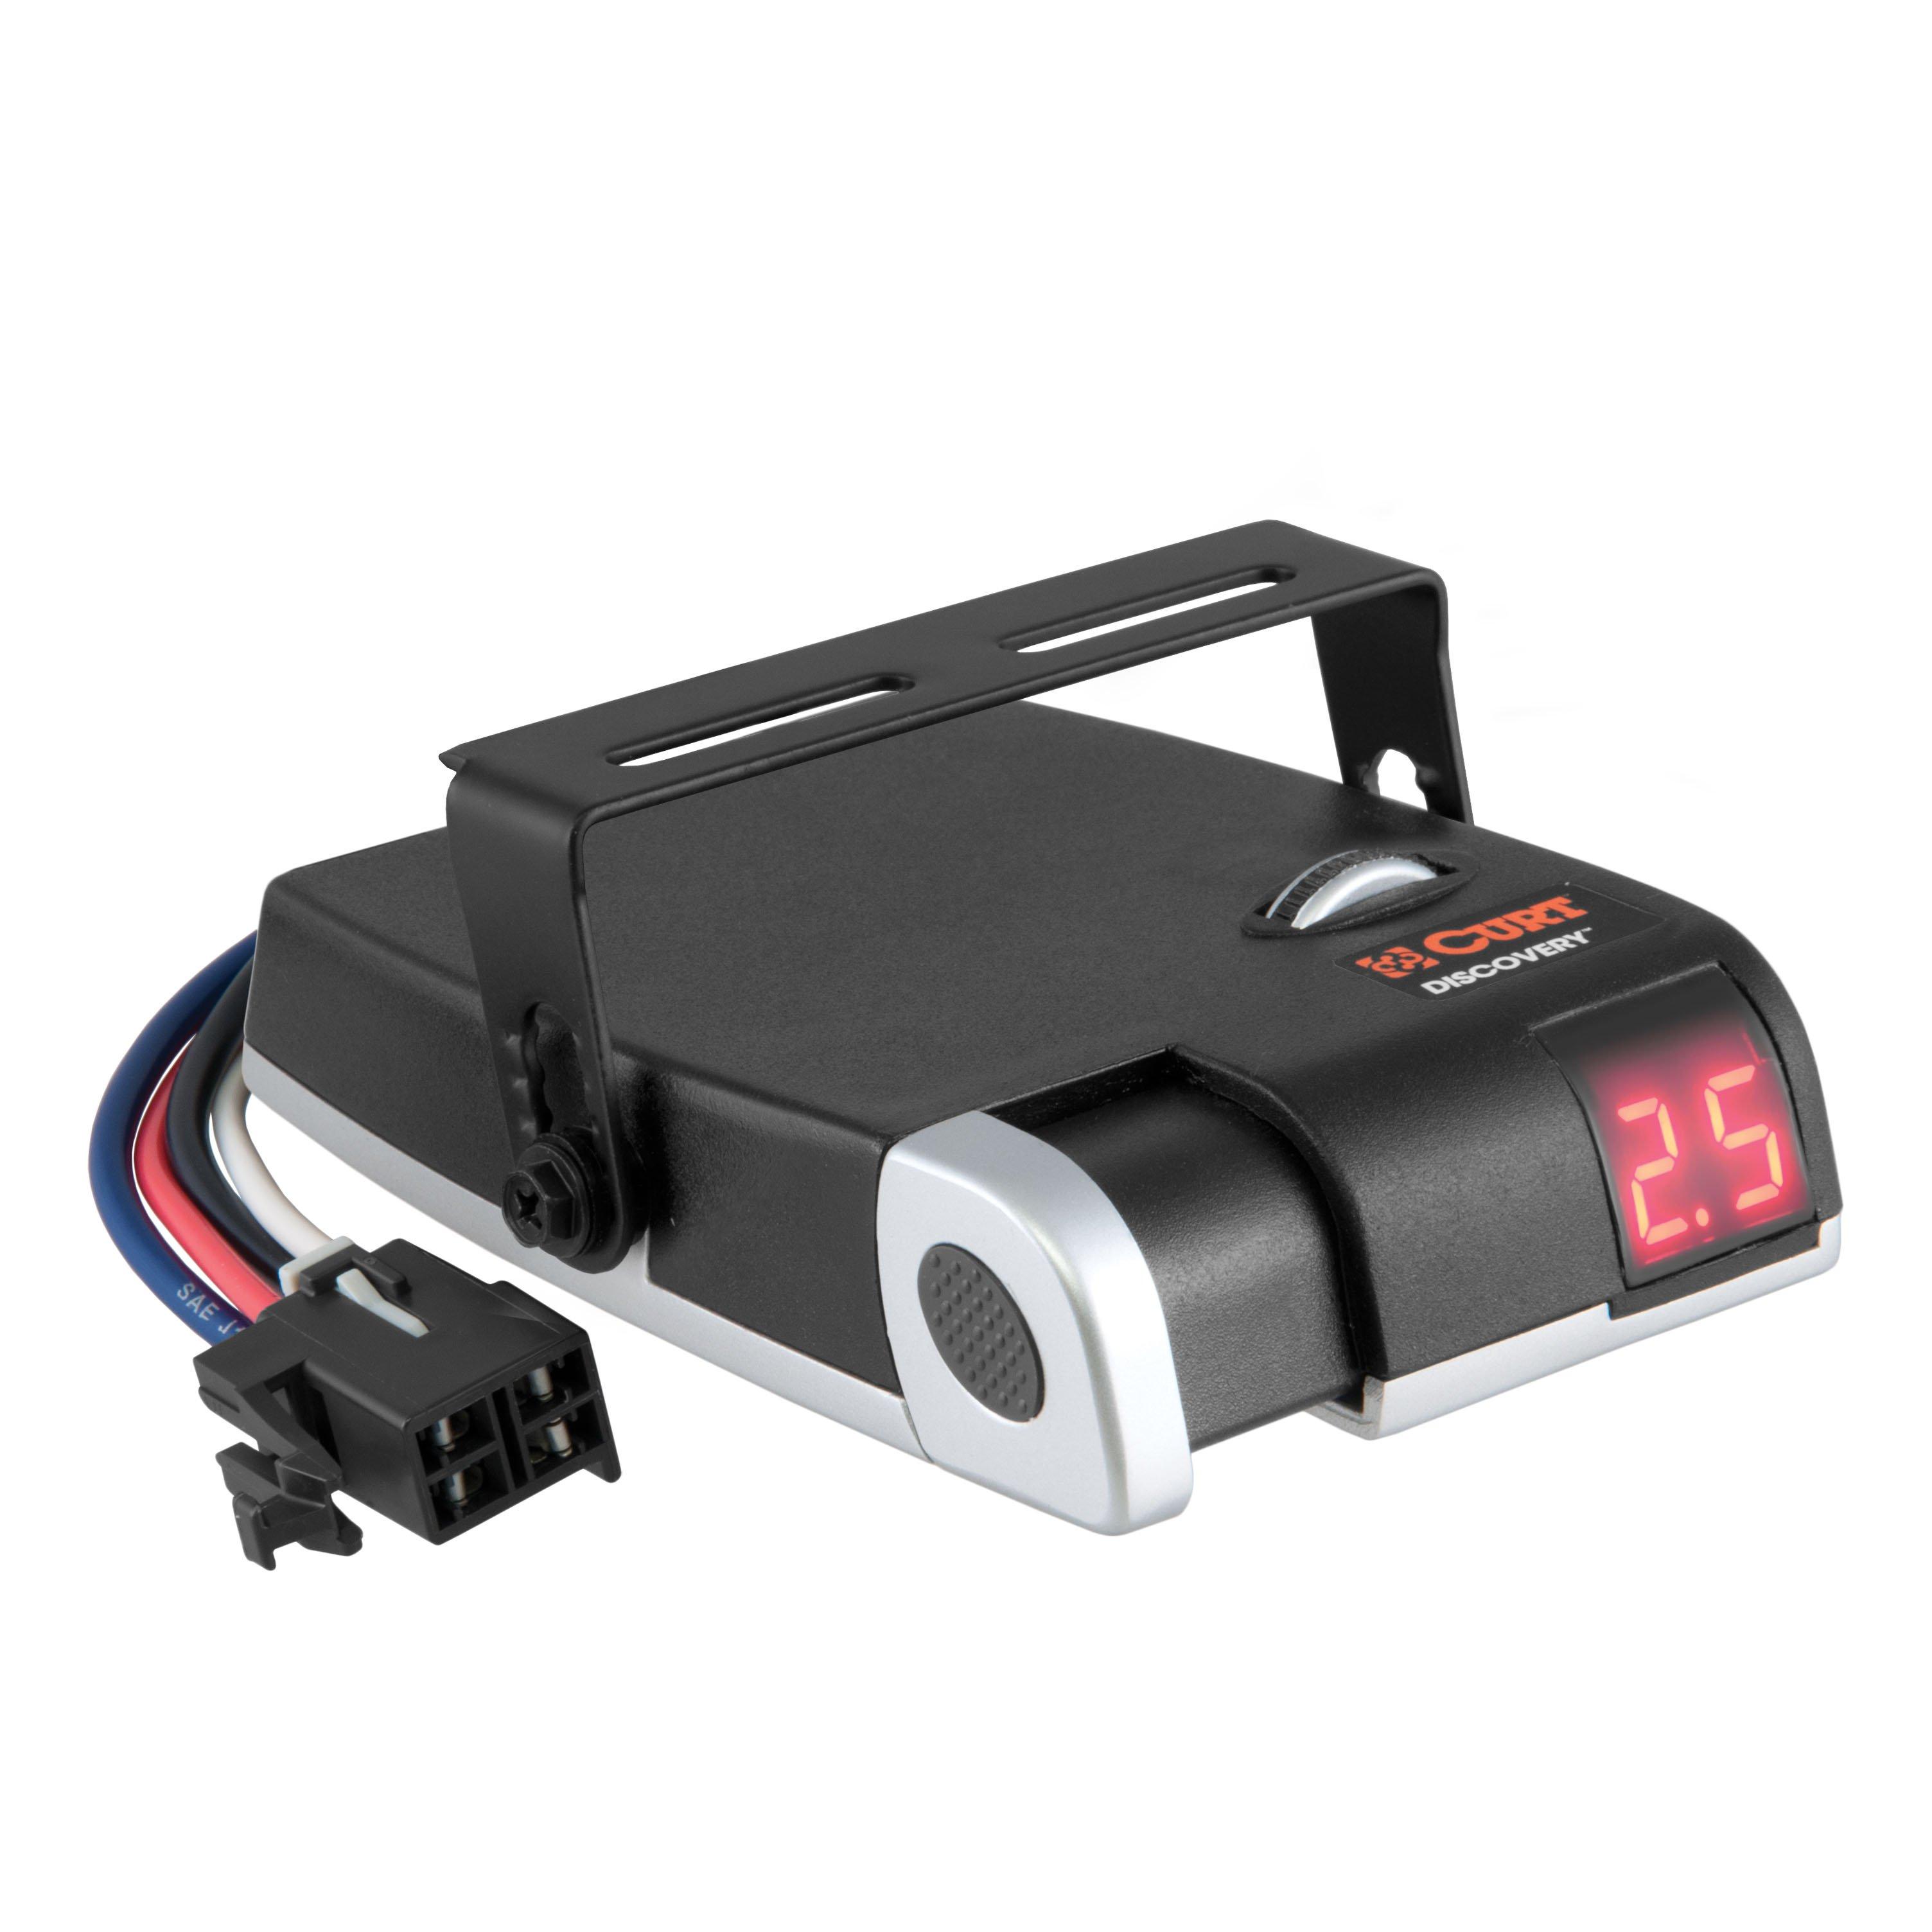 curt discovery brake controller wiring kit for dodge ram. Black Bedroom Furniture Sets. Home Design Ideas